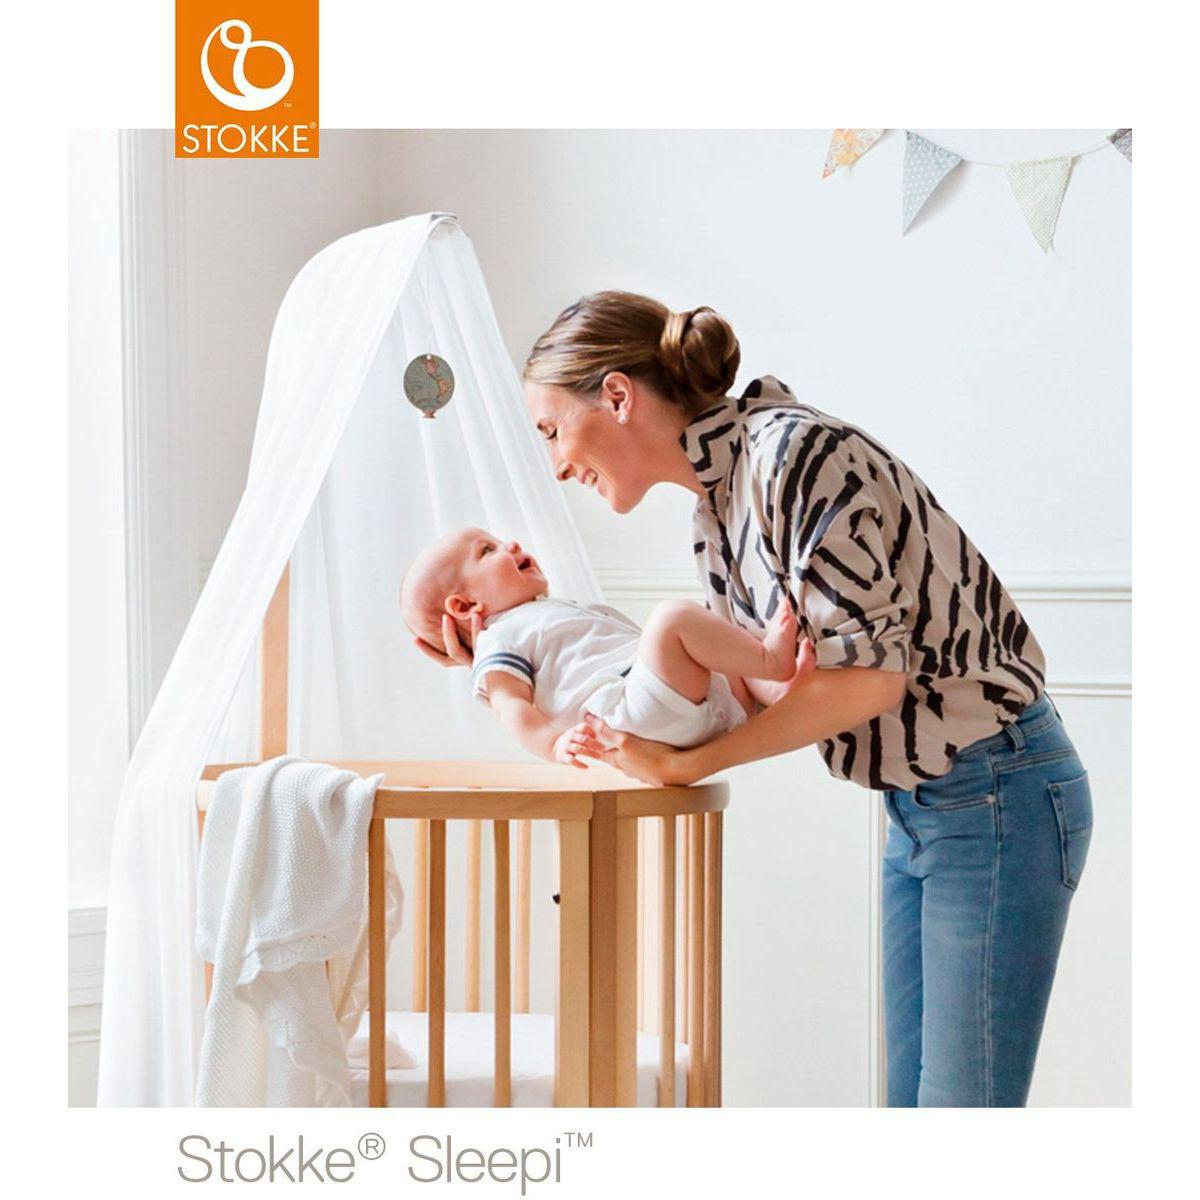 Dosel Mini cuna y Cuna bebé SLEEPI STOKKE blanco